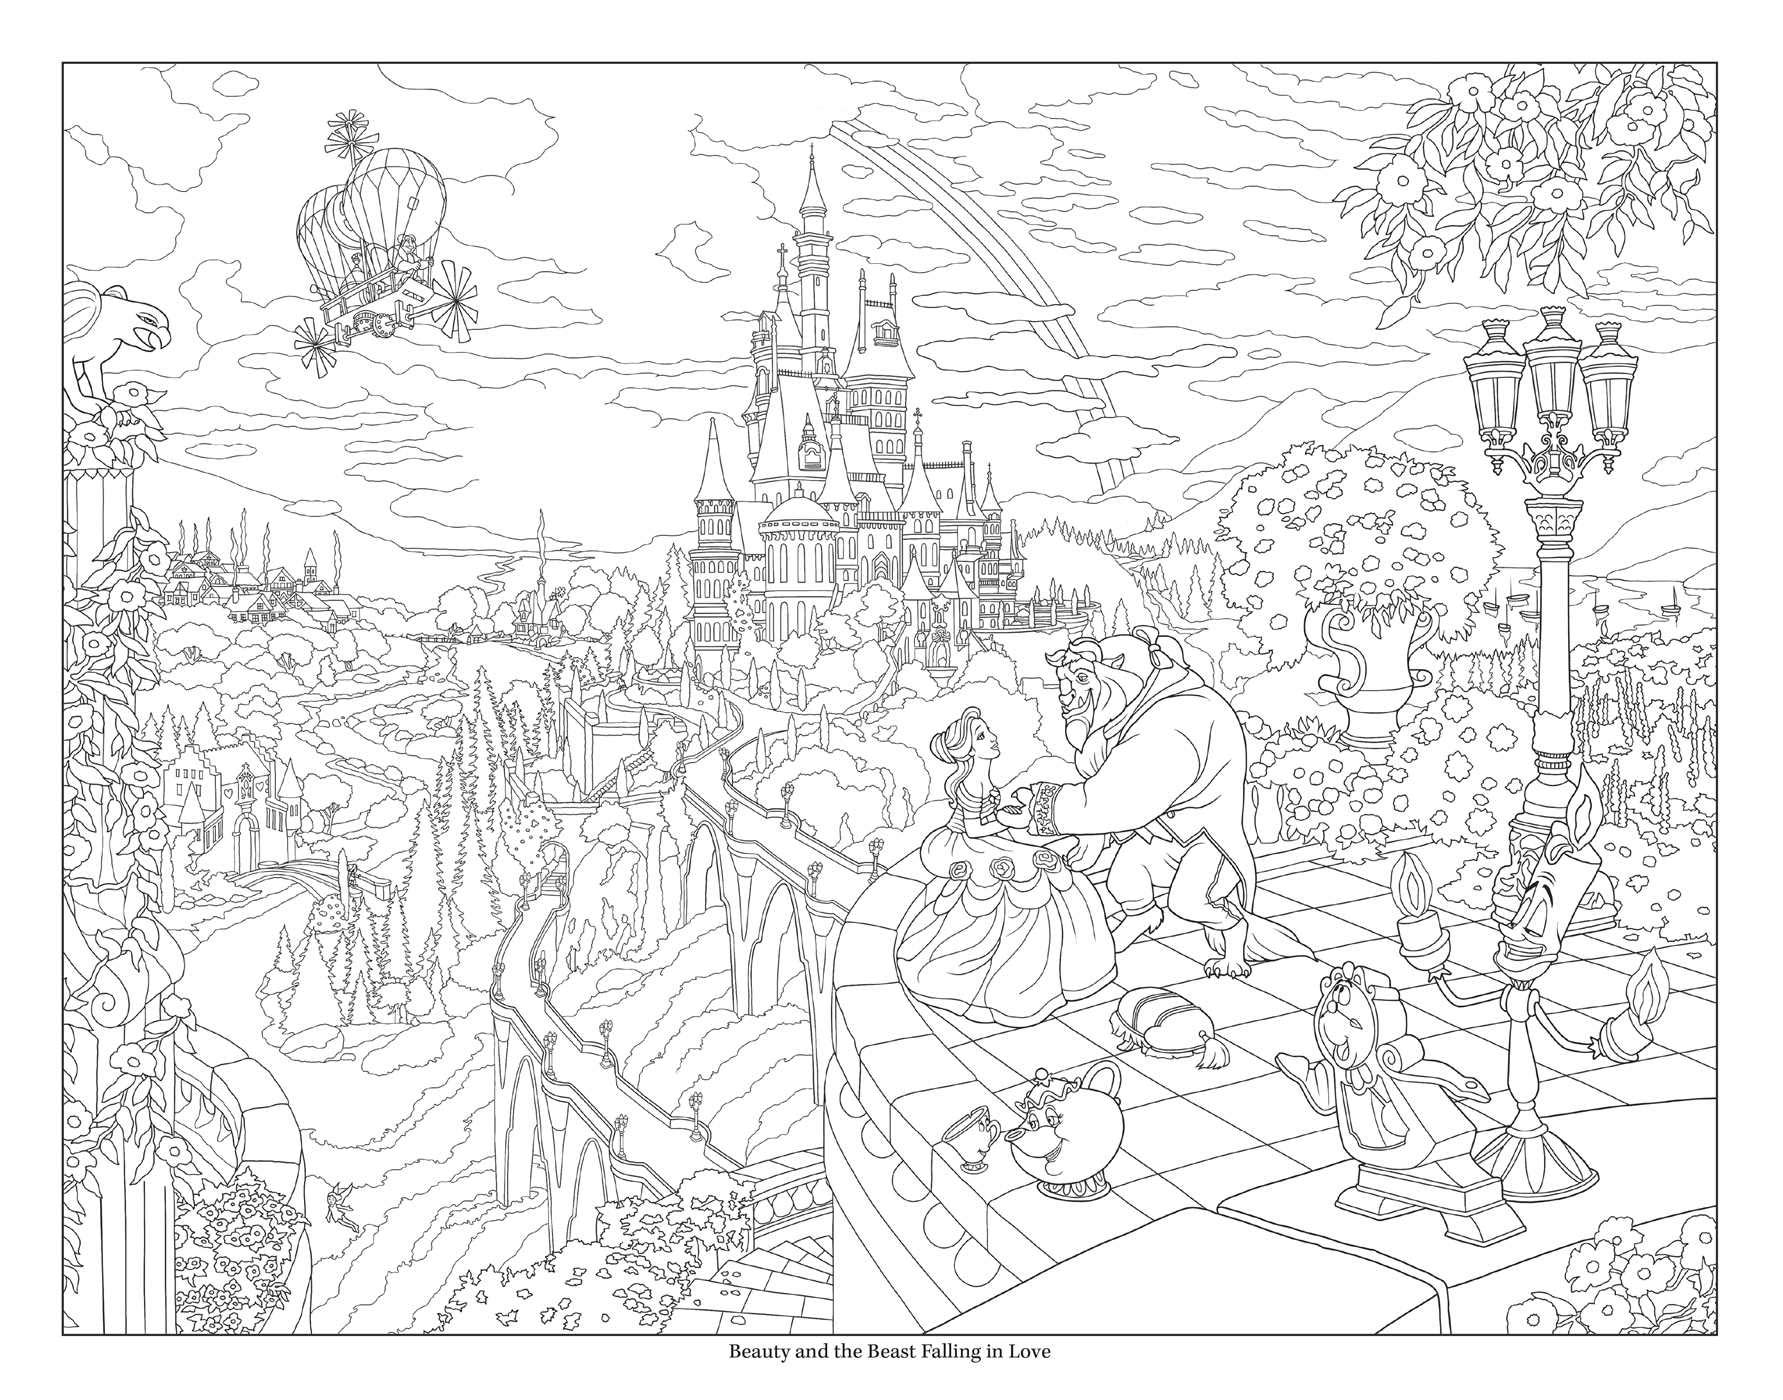 Disney Dreams Collection Thomas Kinkade Studios Disney Princess Coloring Poster Amazon De Kinkade Thomas Fremdsprachige Bucher